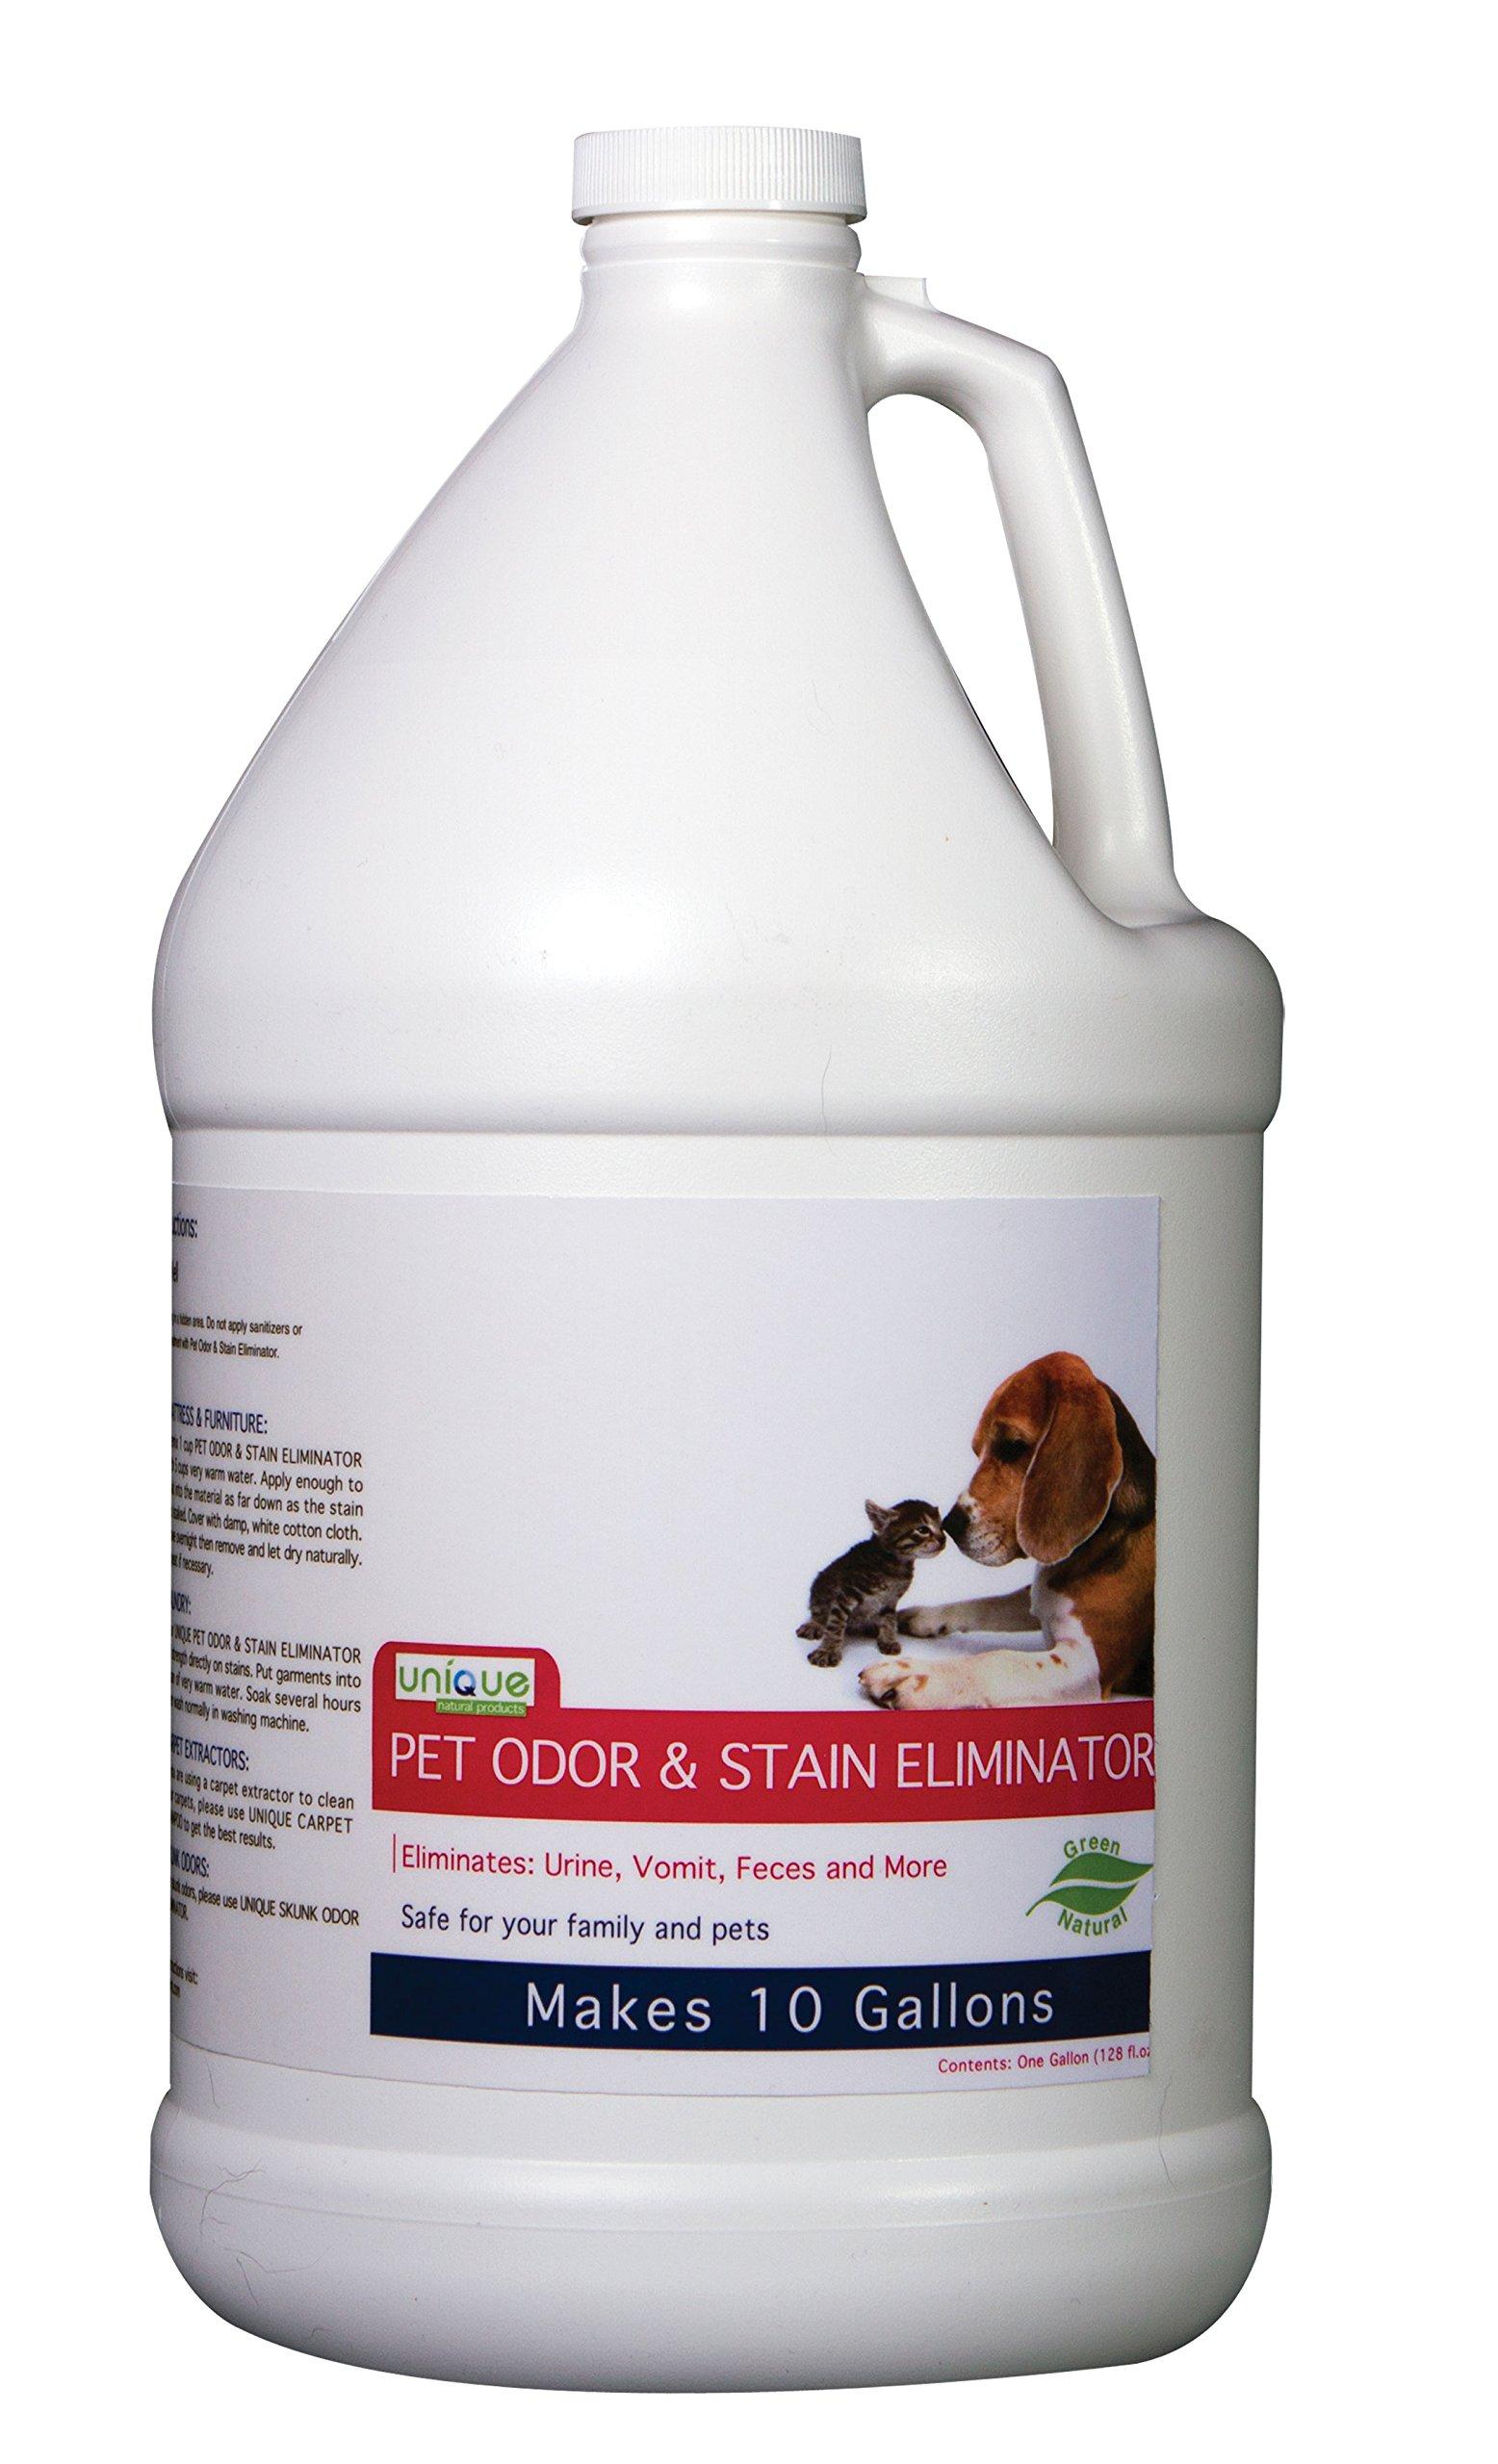 Unique 205-1 Pet Odor and Stain Eliminator - Gallon by Unique